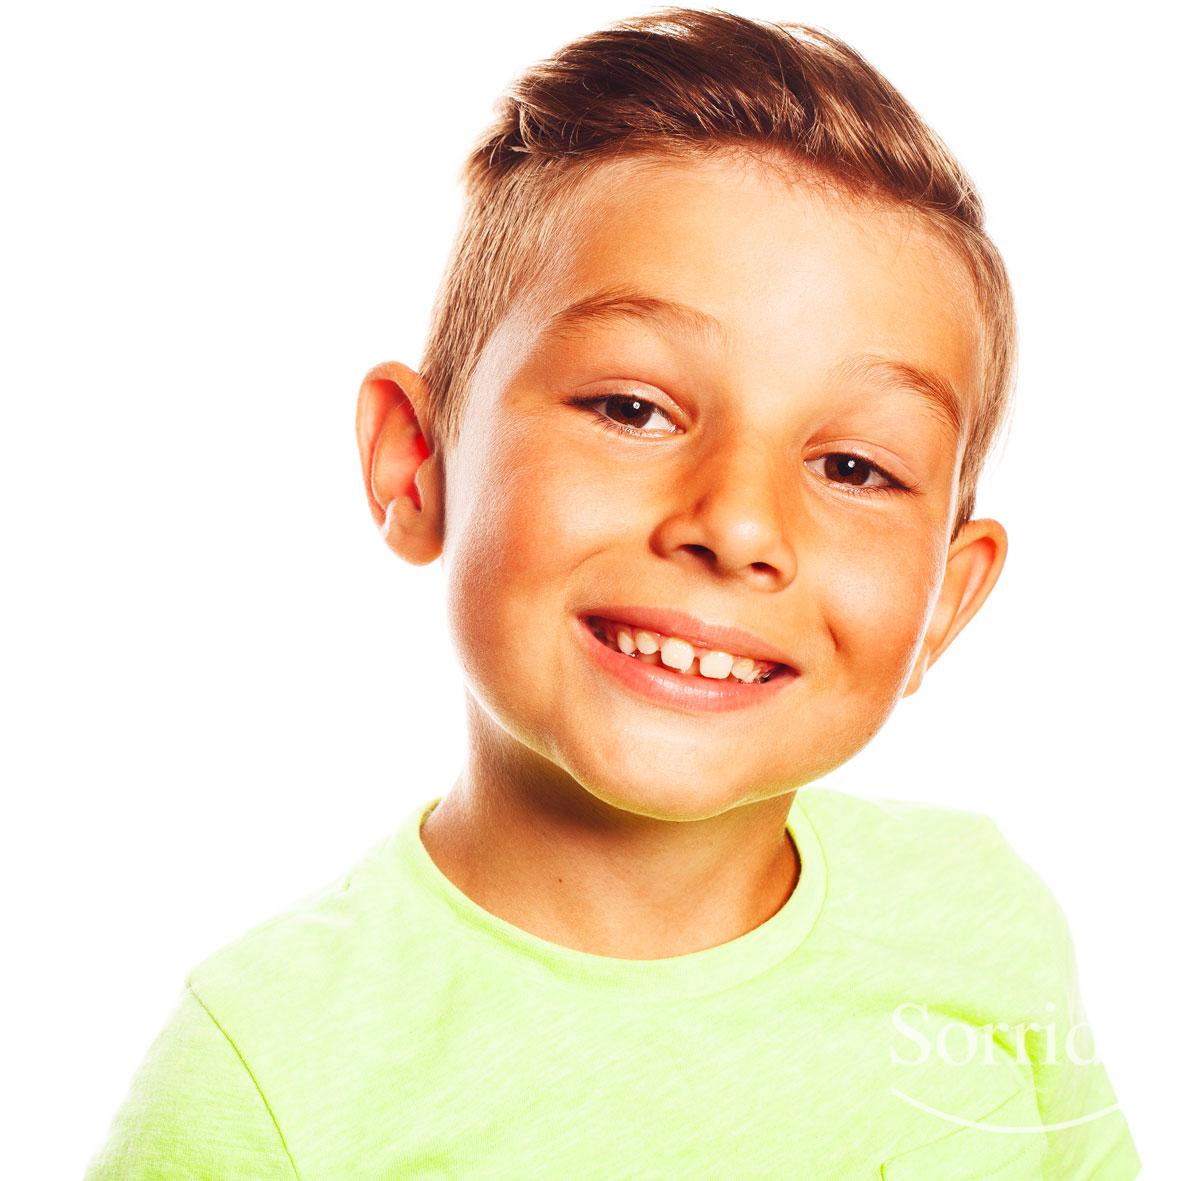 Sorridi-ch-magazine-diastema-dentale-nei-bambini